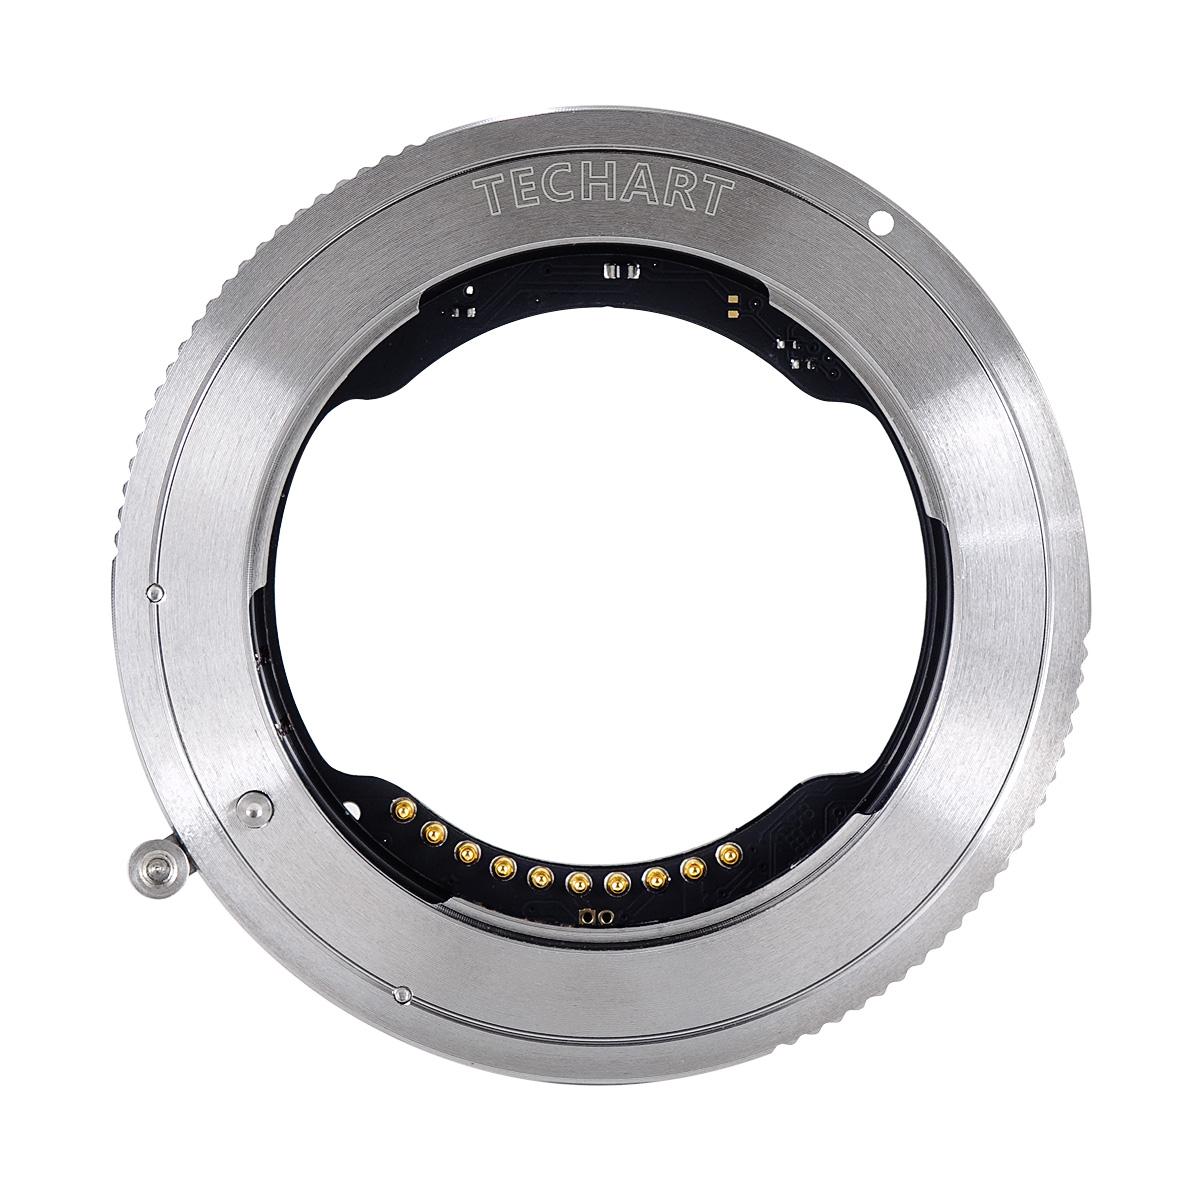 TECHART TZE-01(ソニーEマウントレンズ → ニコンZマウント変換)電子マウントアダプター